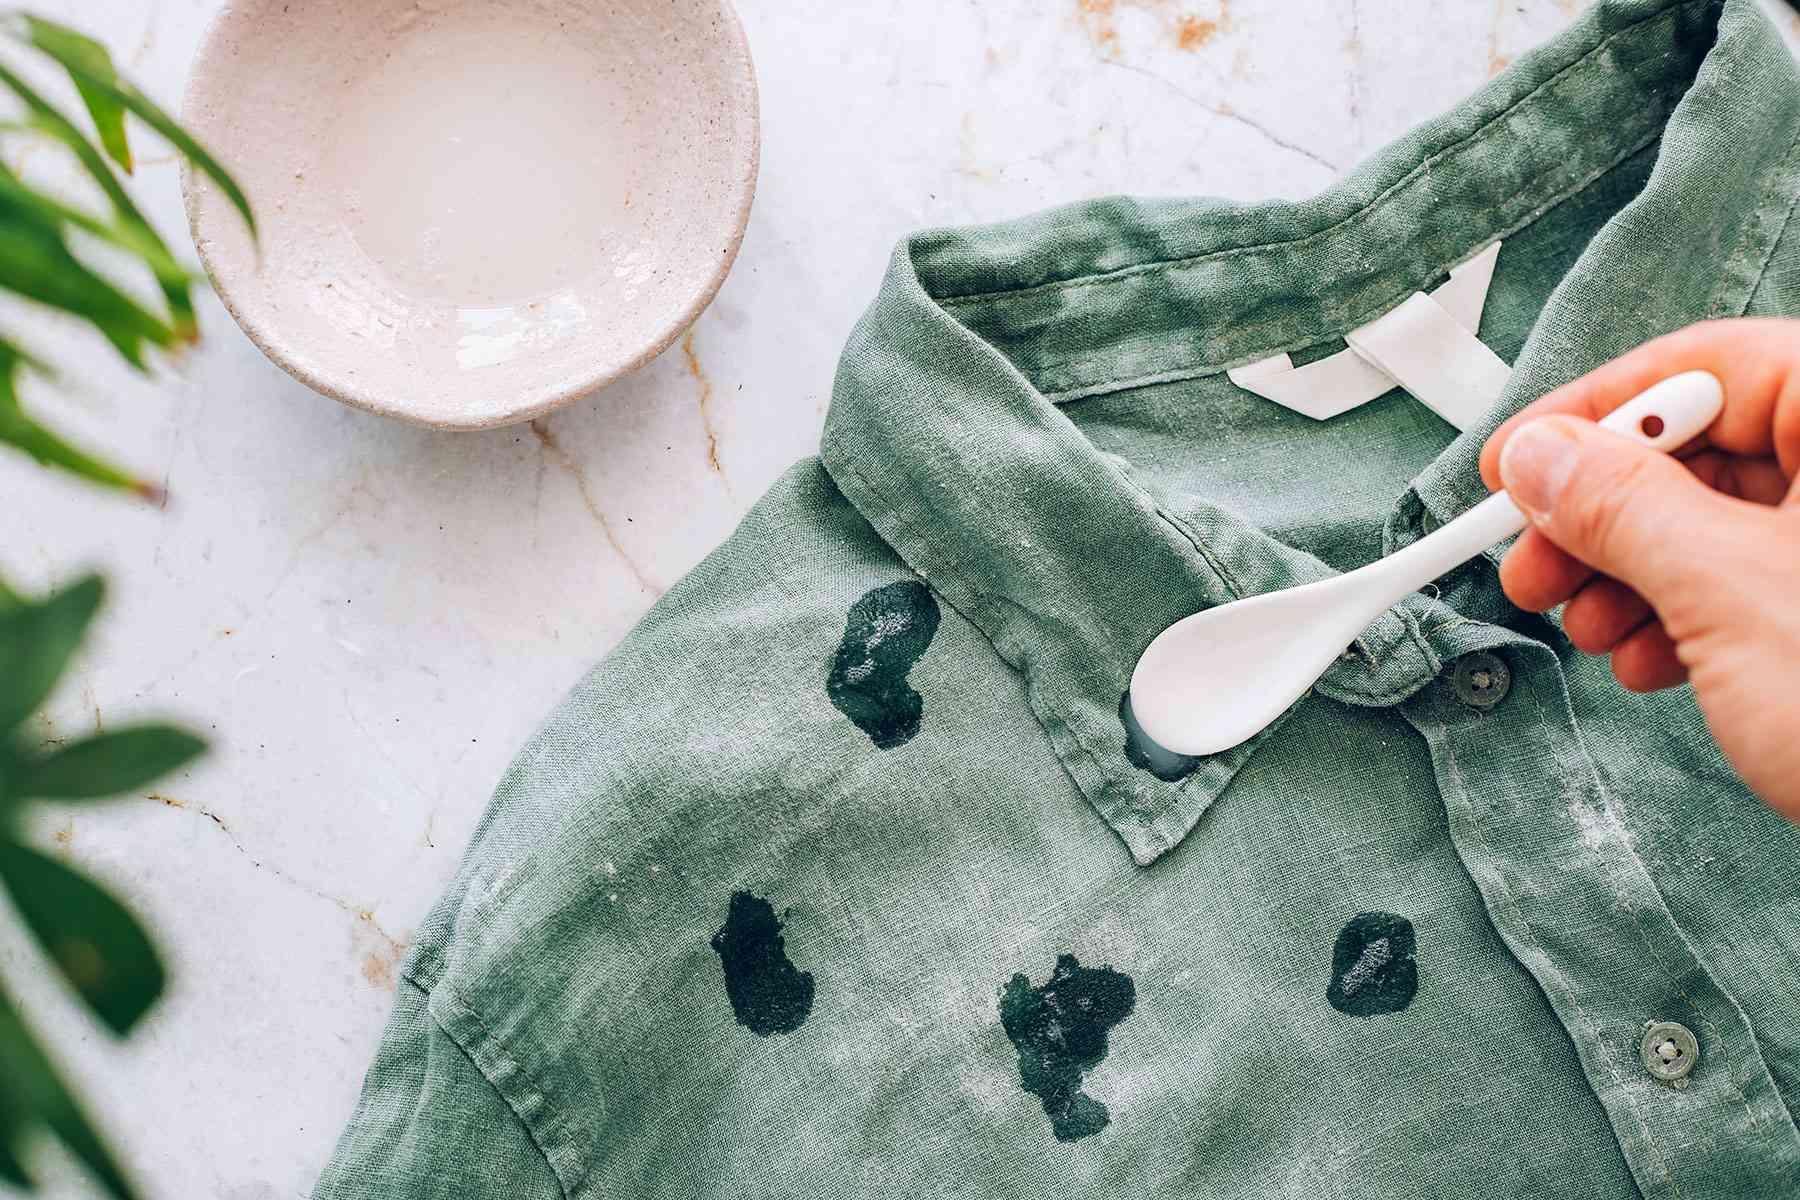 Heavy-duty liquid detergent spot treating mildew stains on green shirt